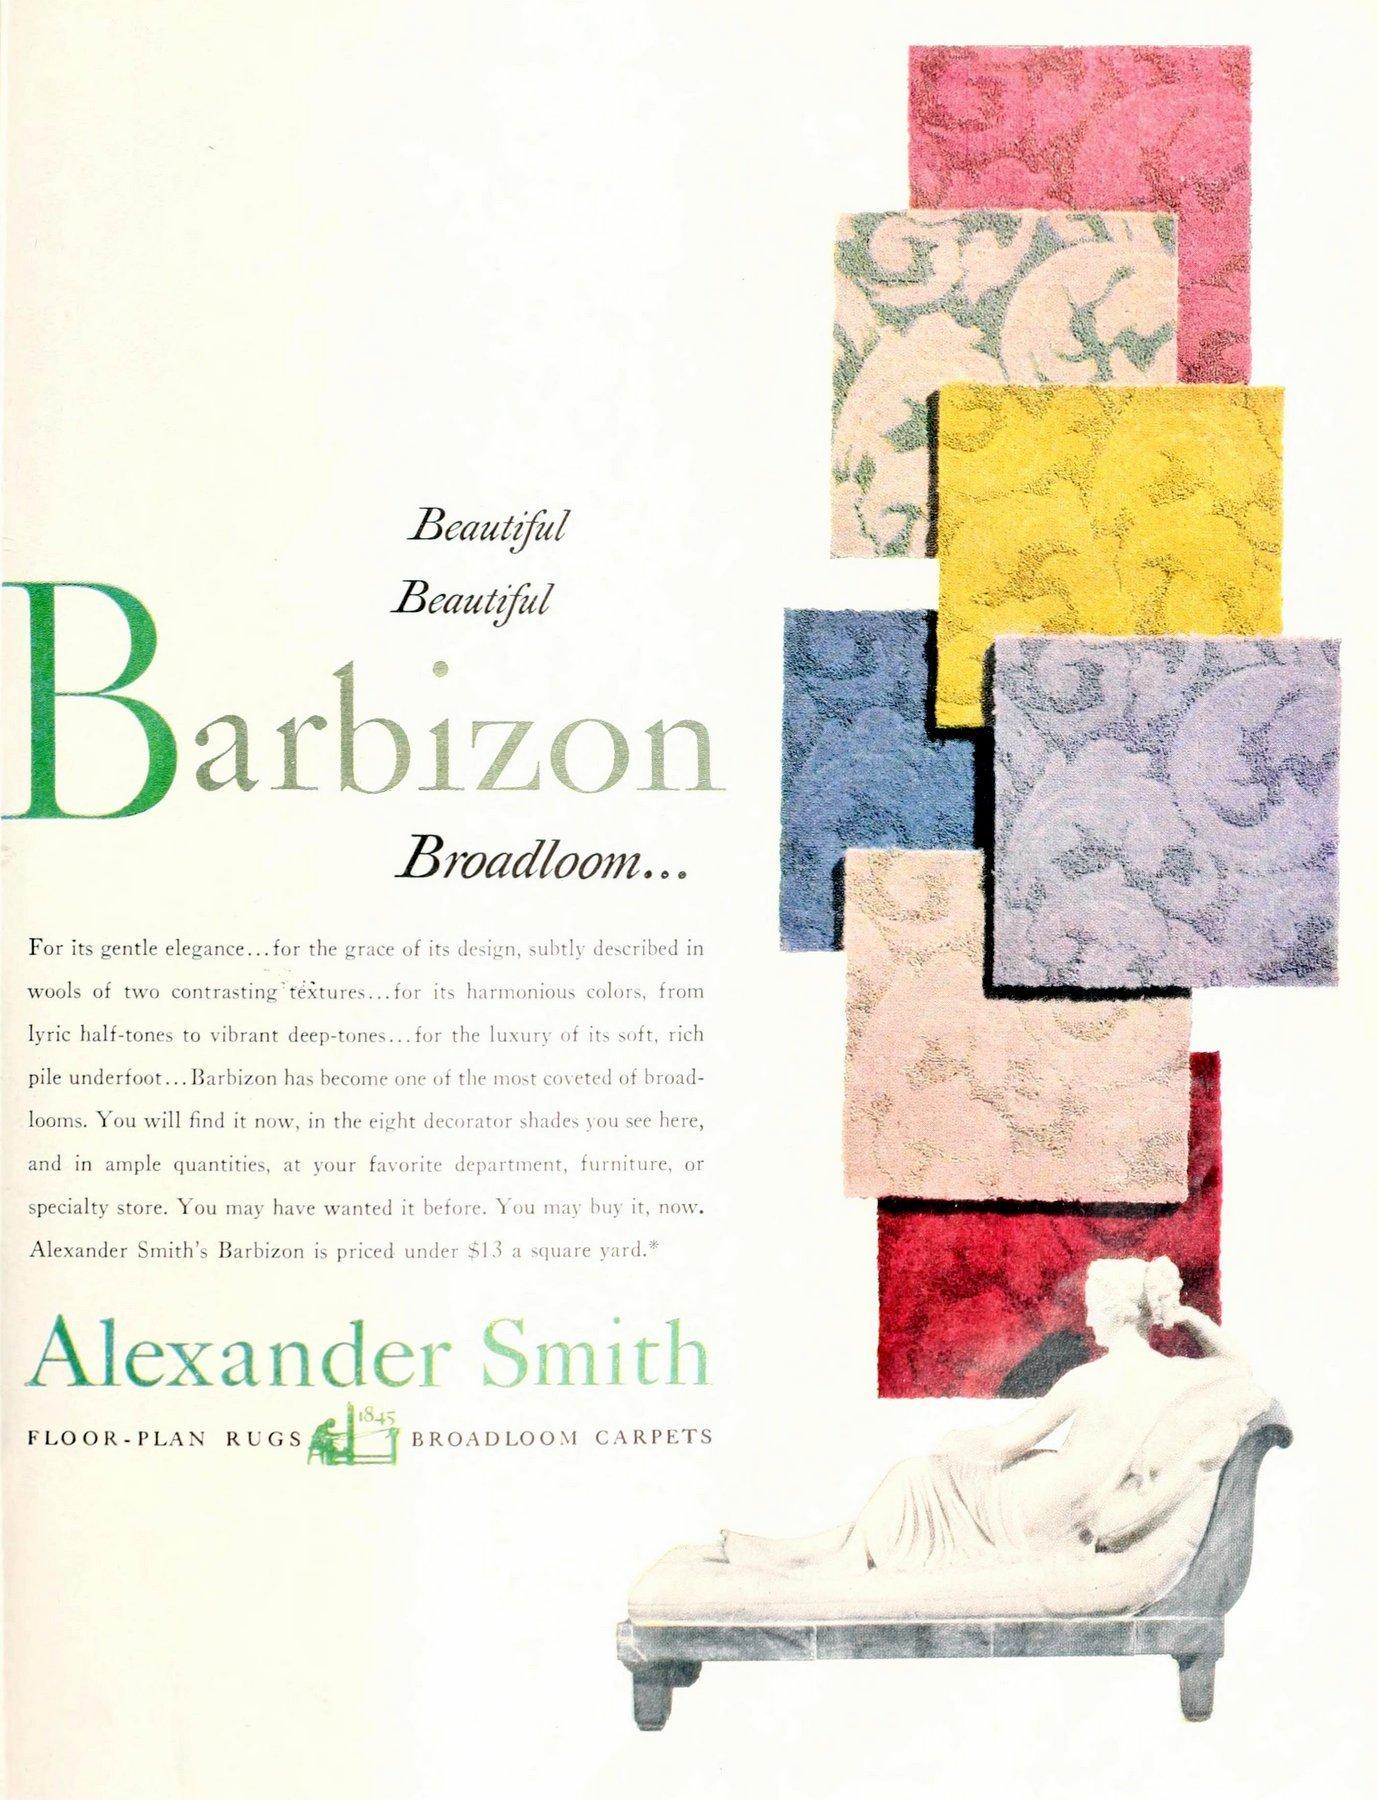 Barbizon brand textured vintage carpets (1950)